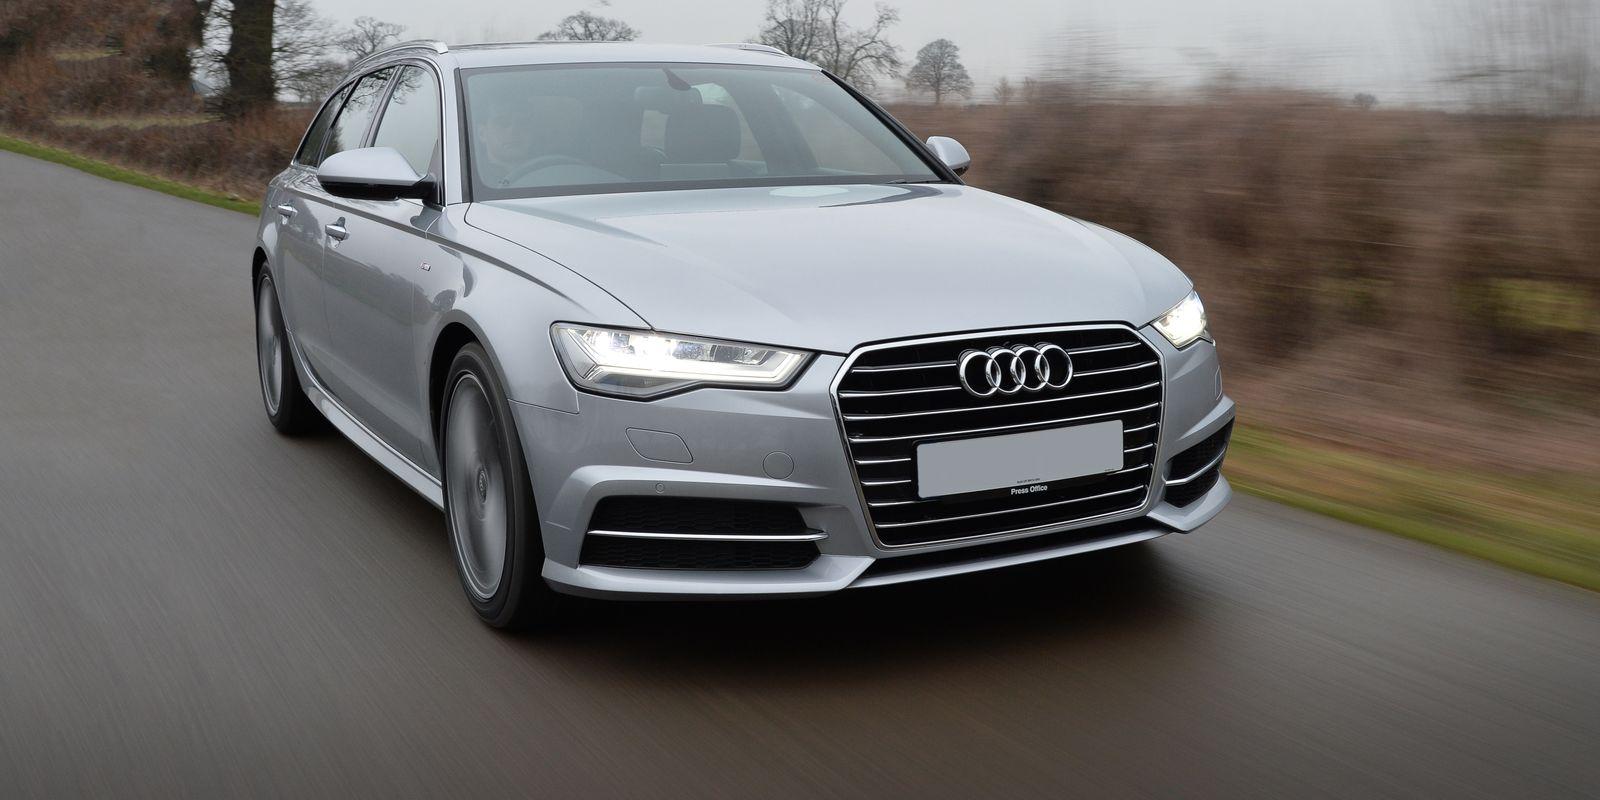 Audi a6 avant review carwow autos post for 2002 audi a6 window problems